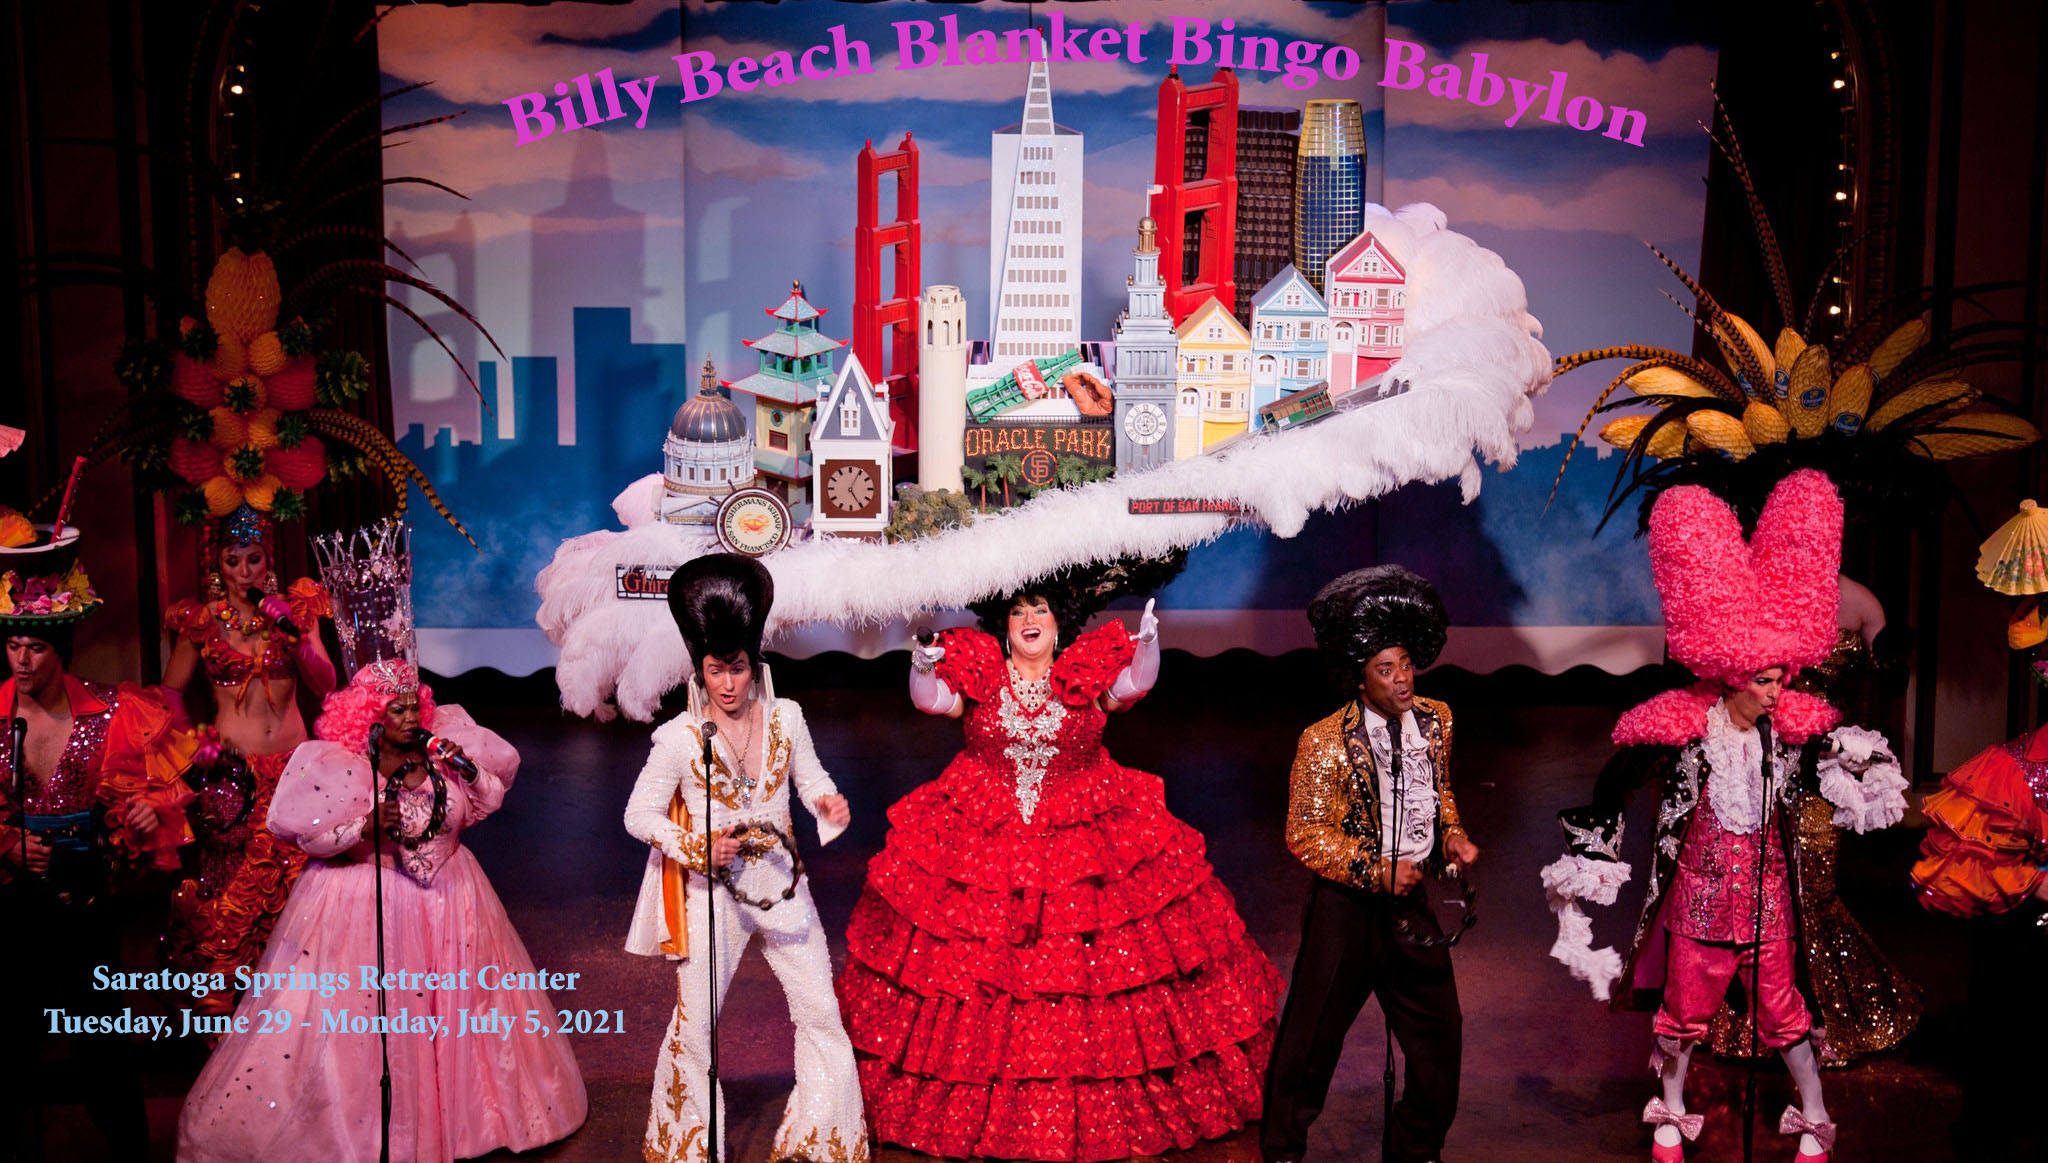 Billy Beach Blanket Bingo Babylon